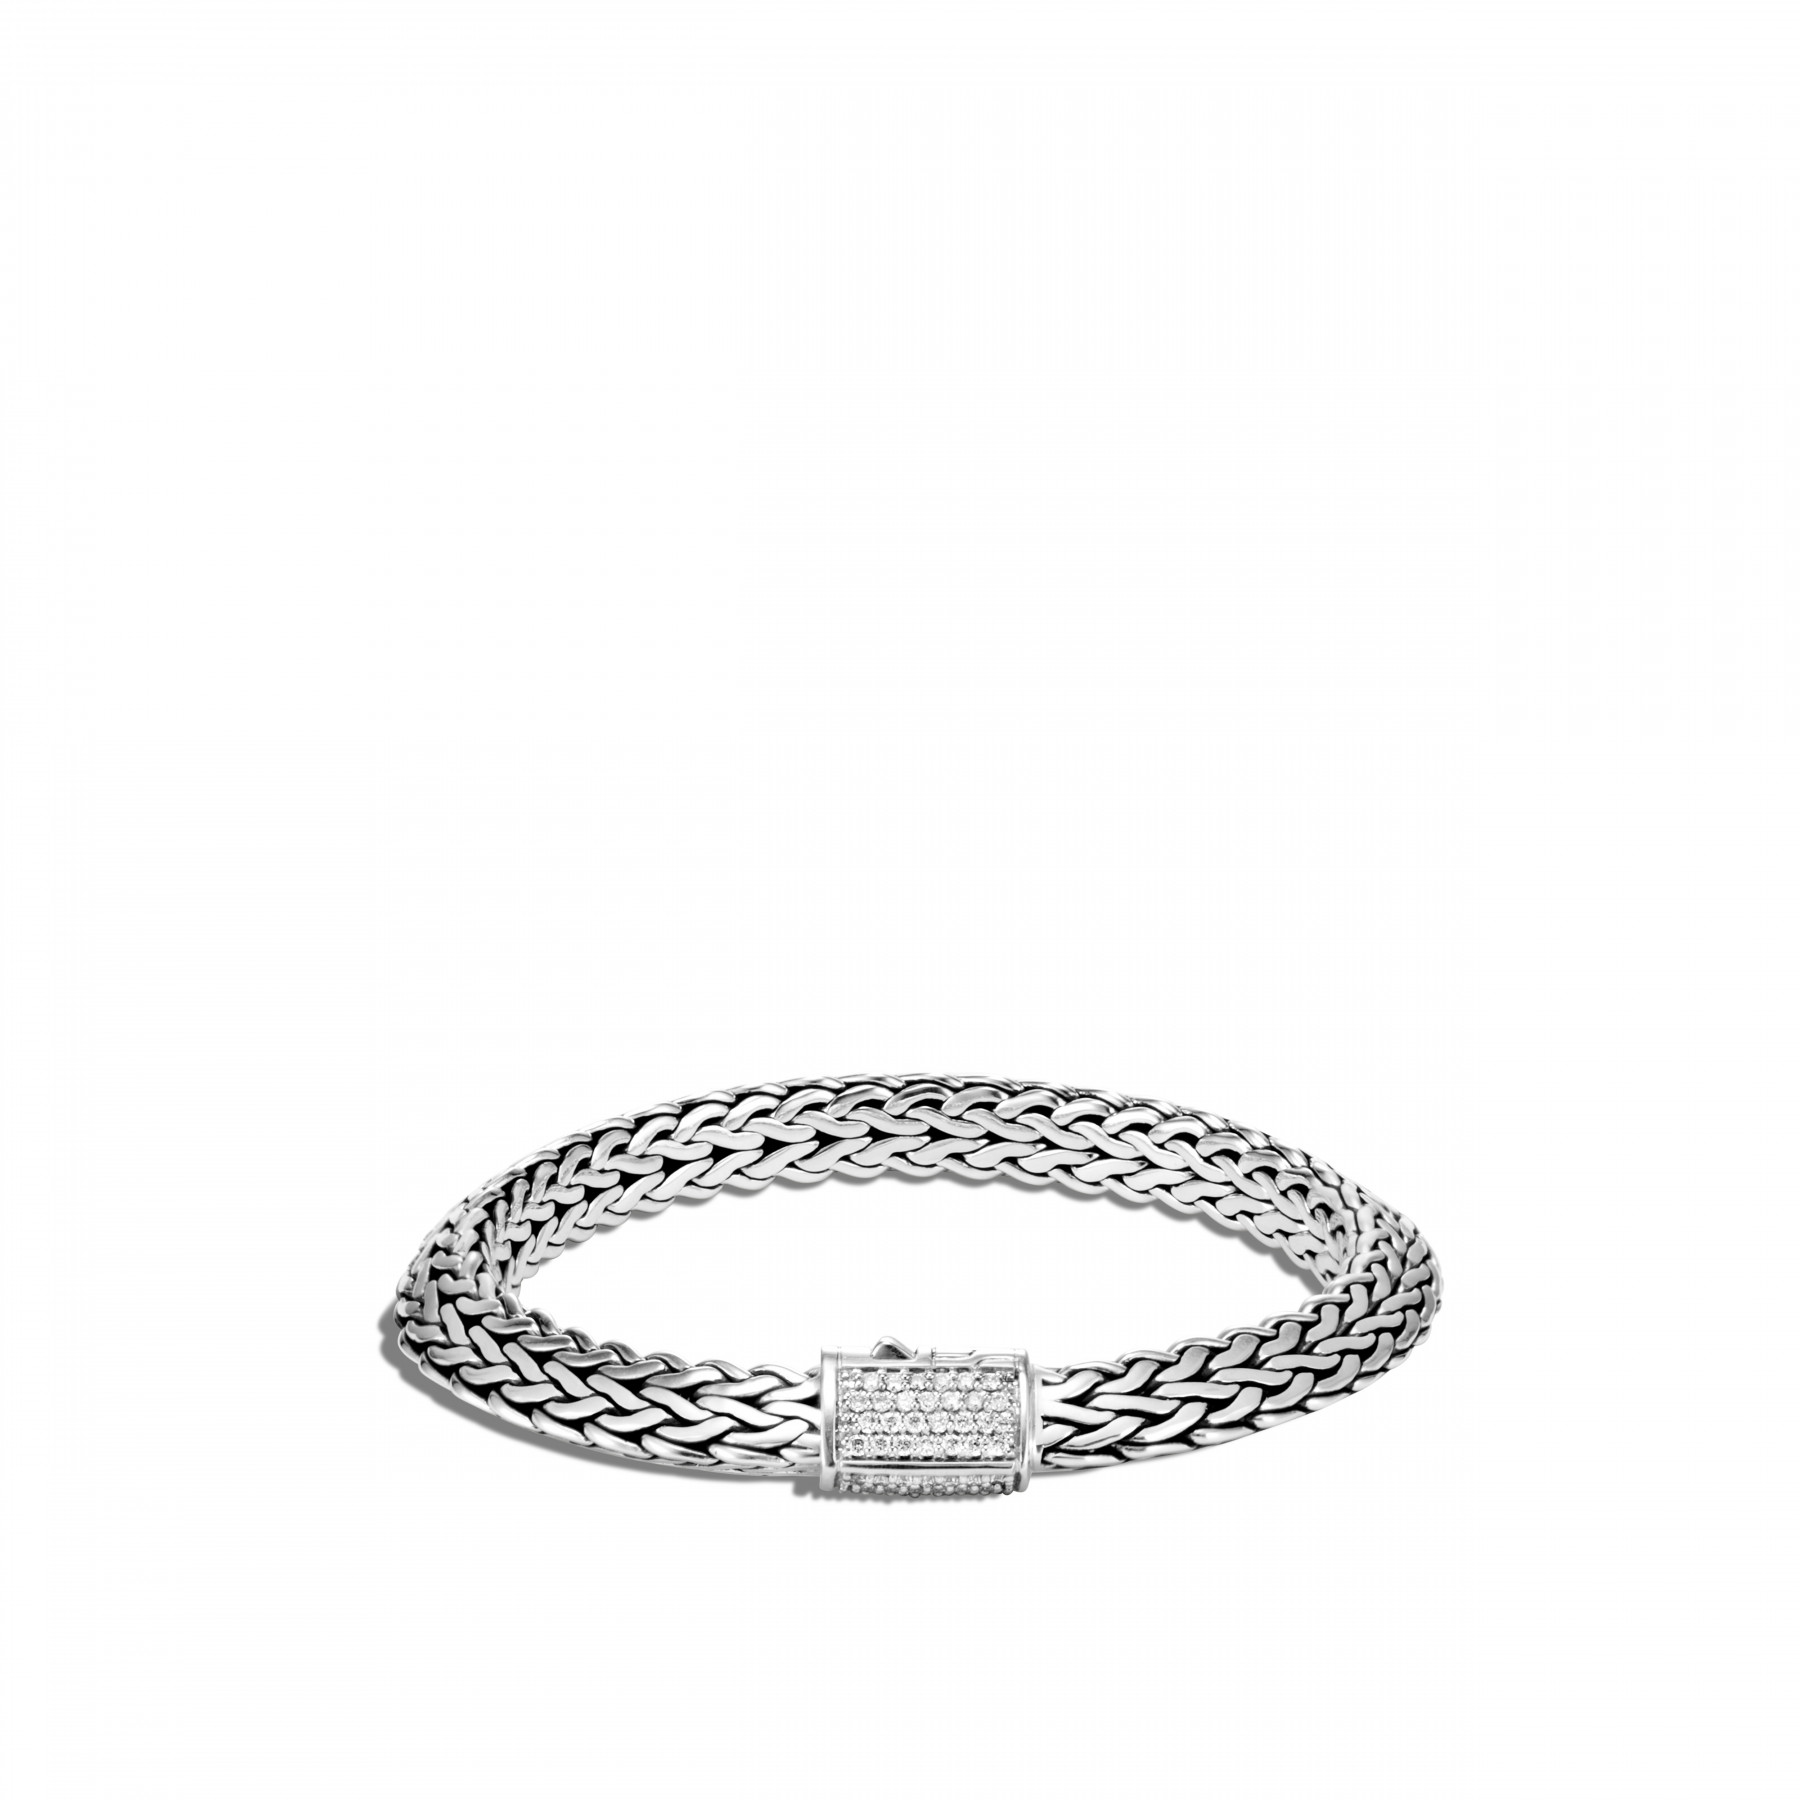 John Hardy Classic Chain Diamond Silver Bracelet - 8mm front view